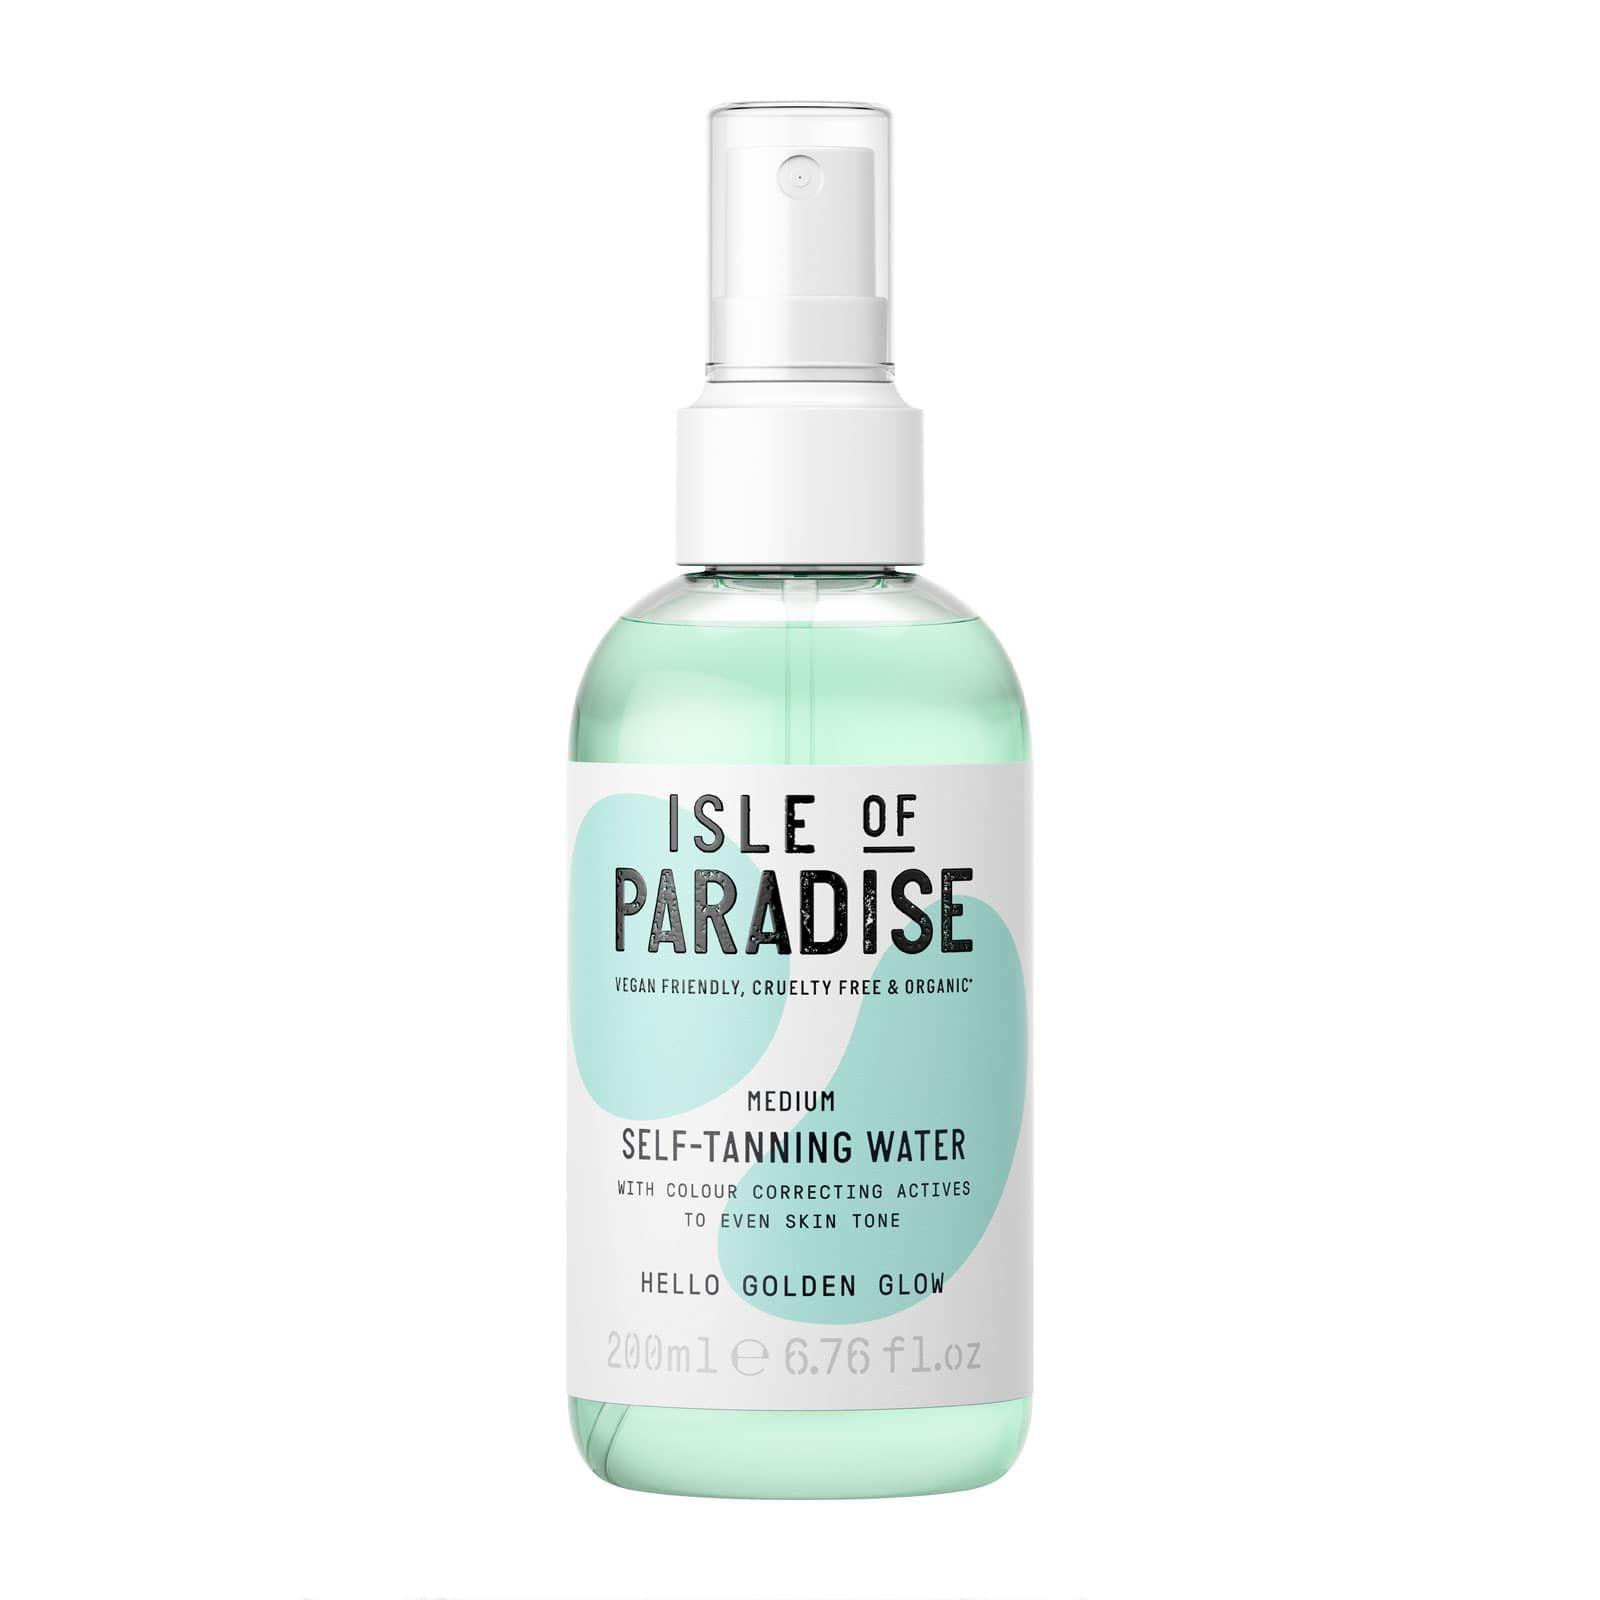 b1800513e1754 Isle of Paradise Self-Tanning Water Medium 200ml